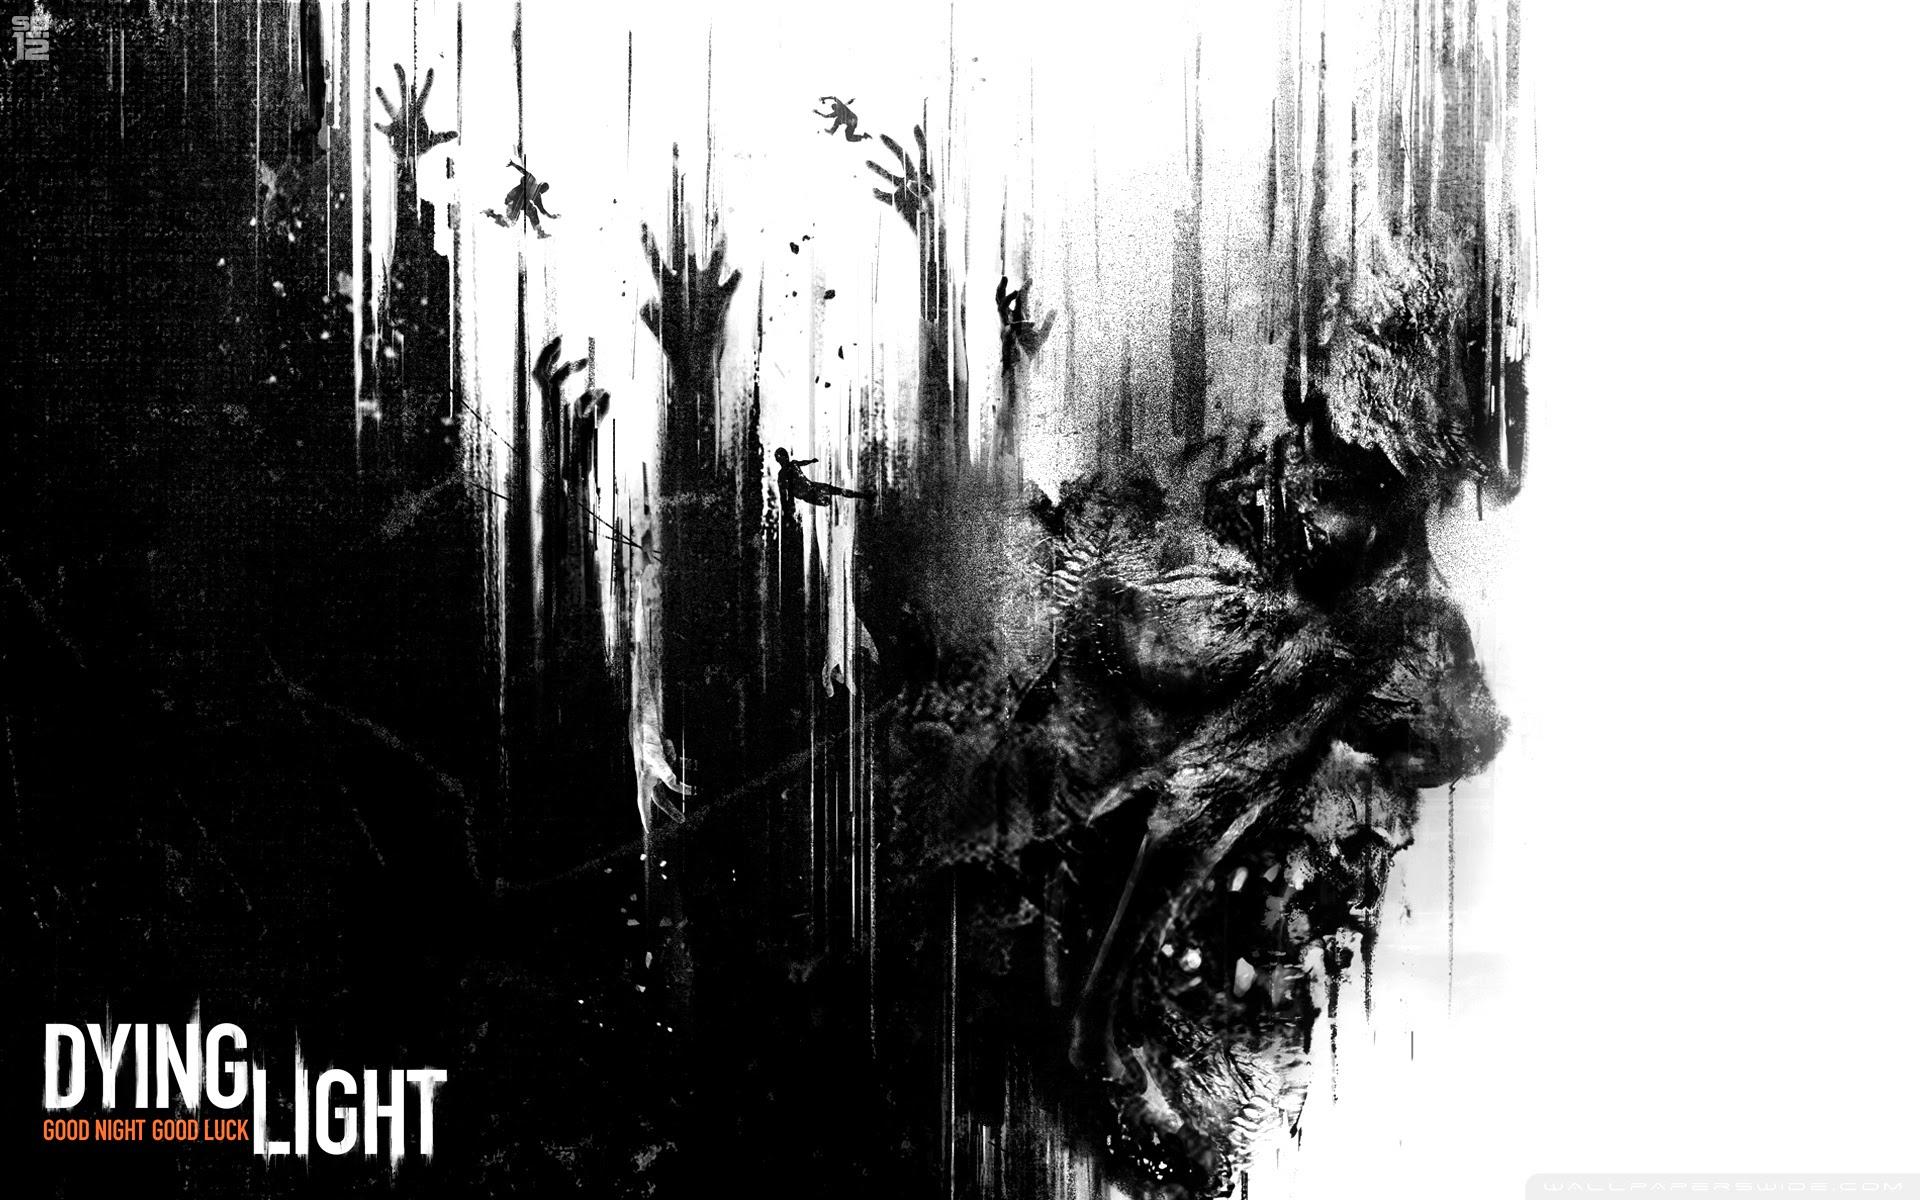 Dying Light Ultra Hd Desktop Background Wallpaper For